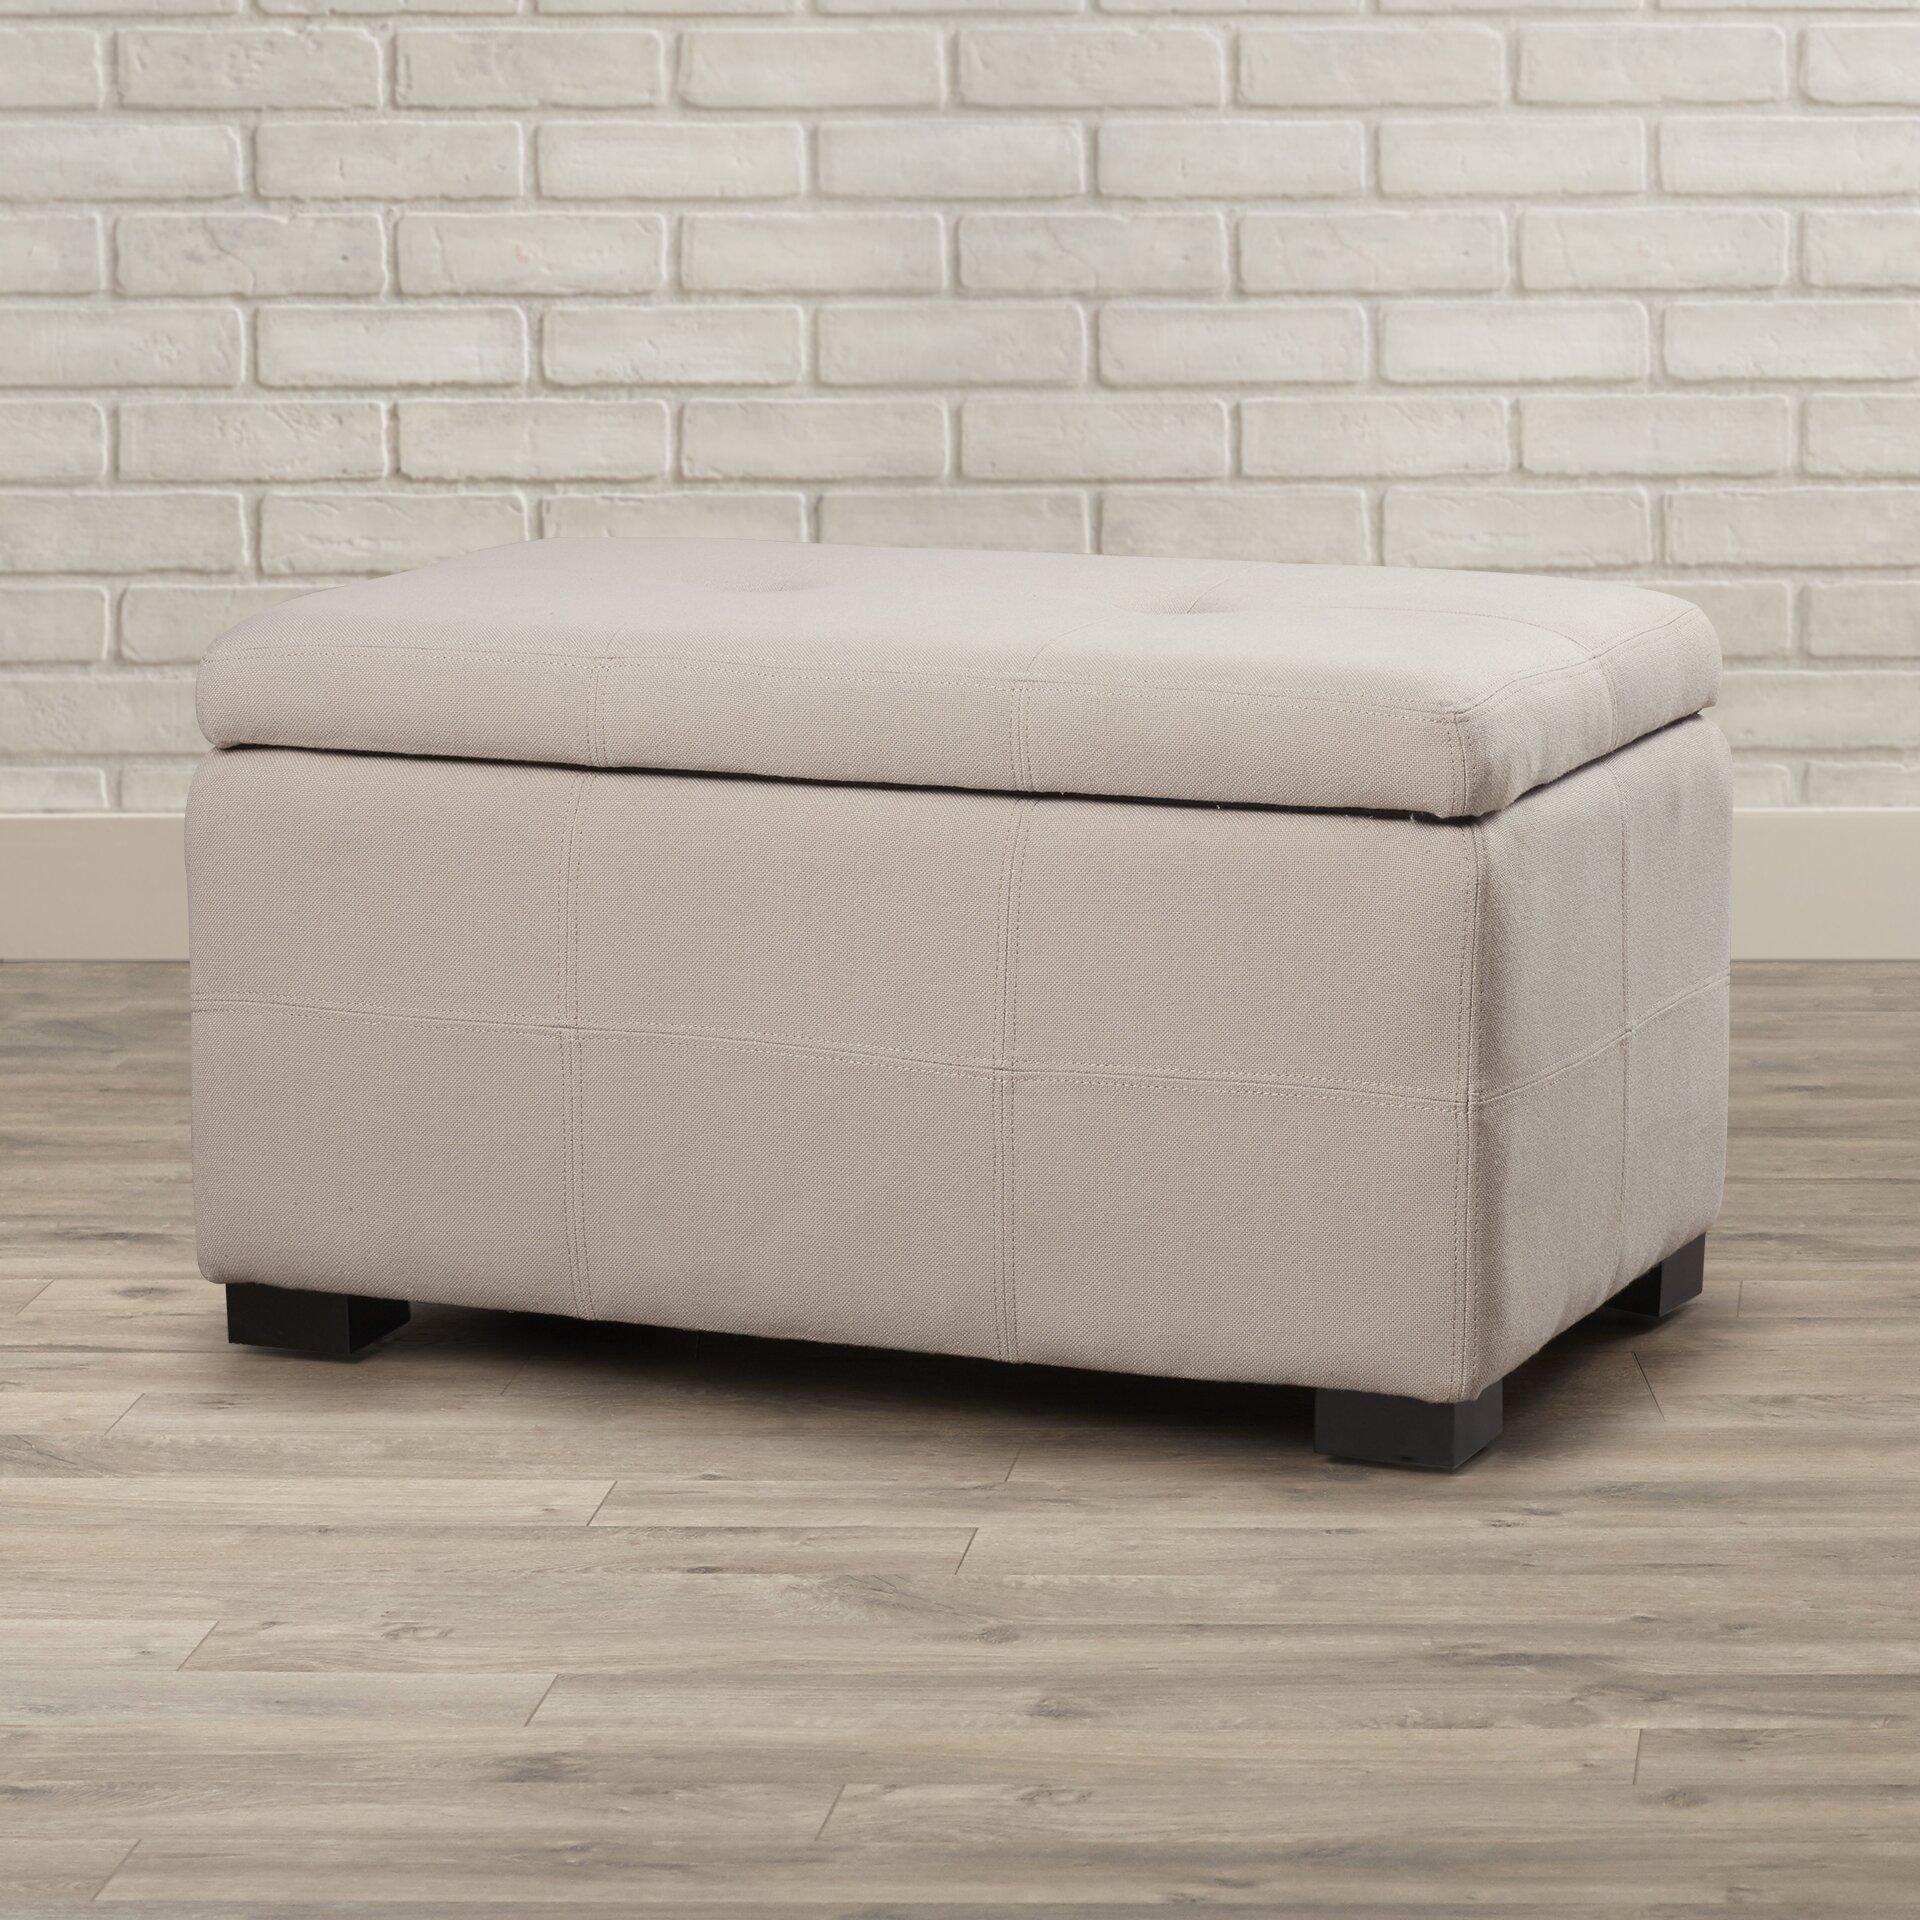 mercury row tufted beige linen storage bedroom bench reviews wayfair. Black Bedroom Furniture Sets. Home Design Ideas